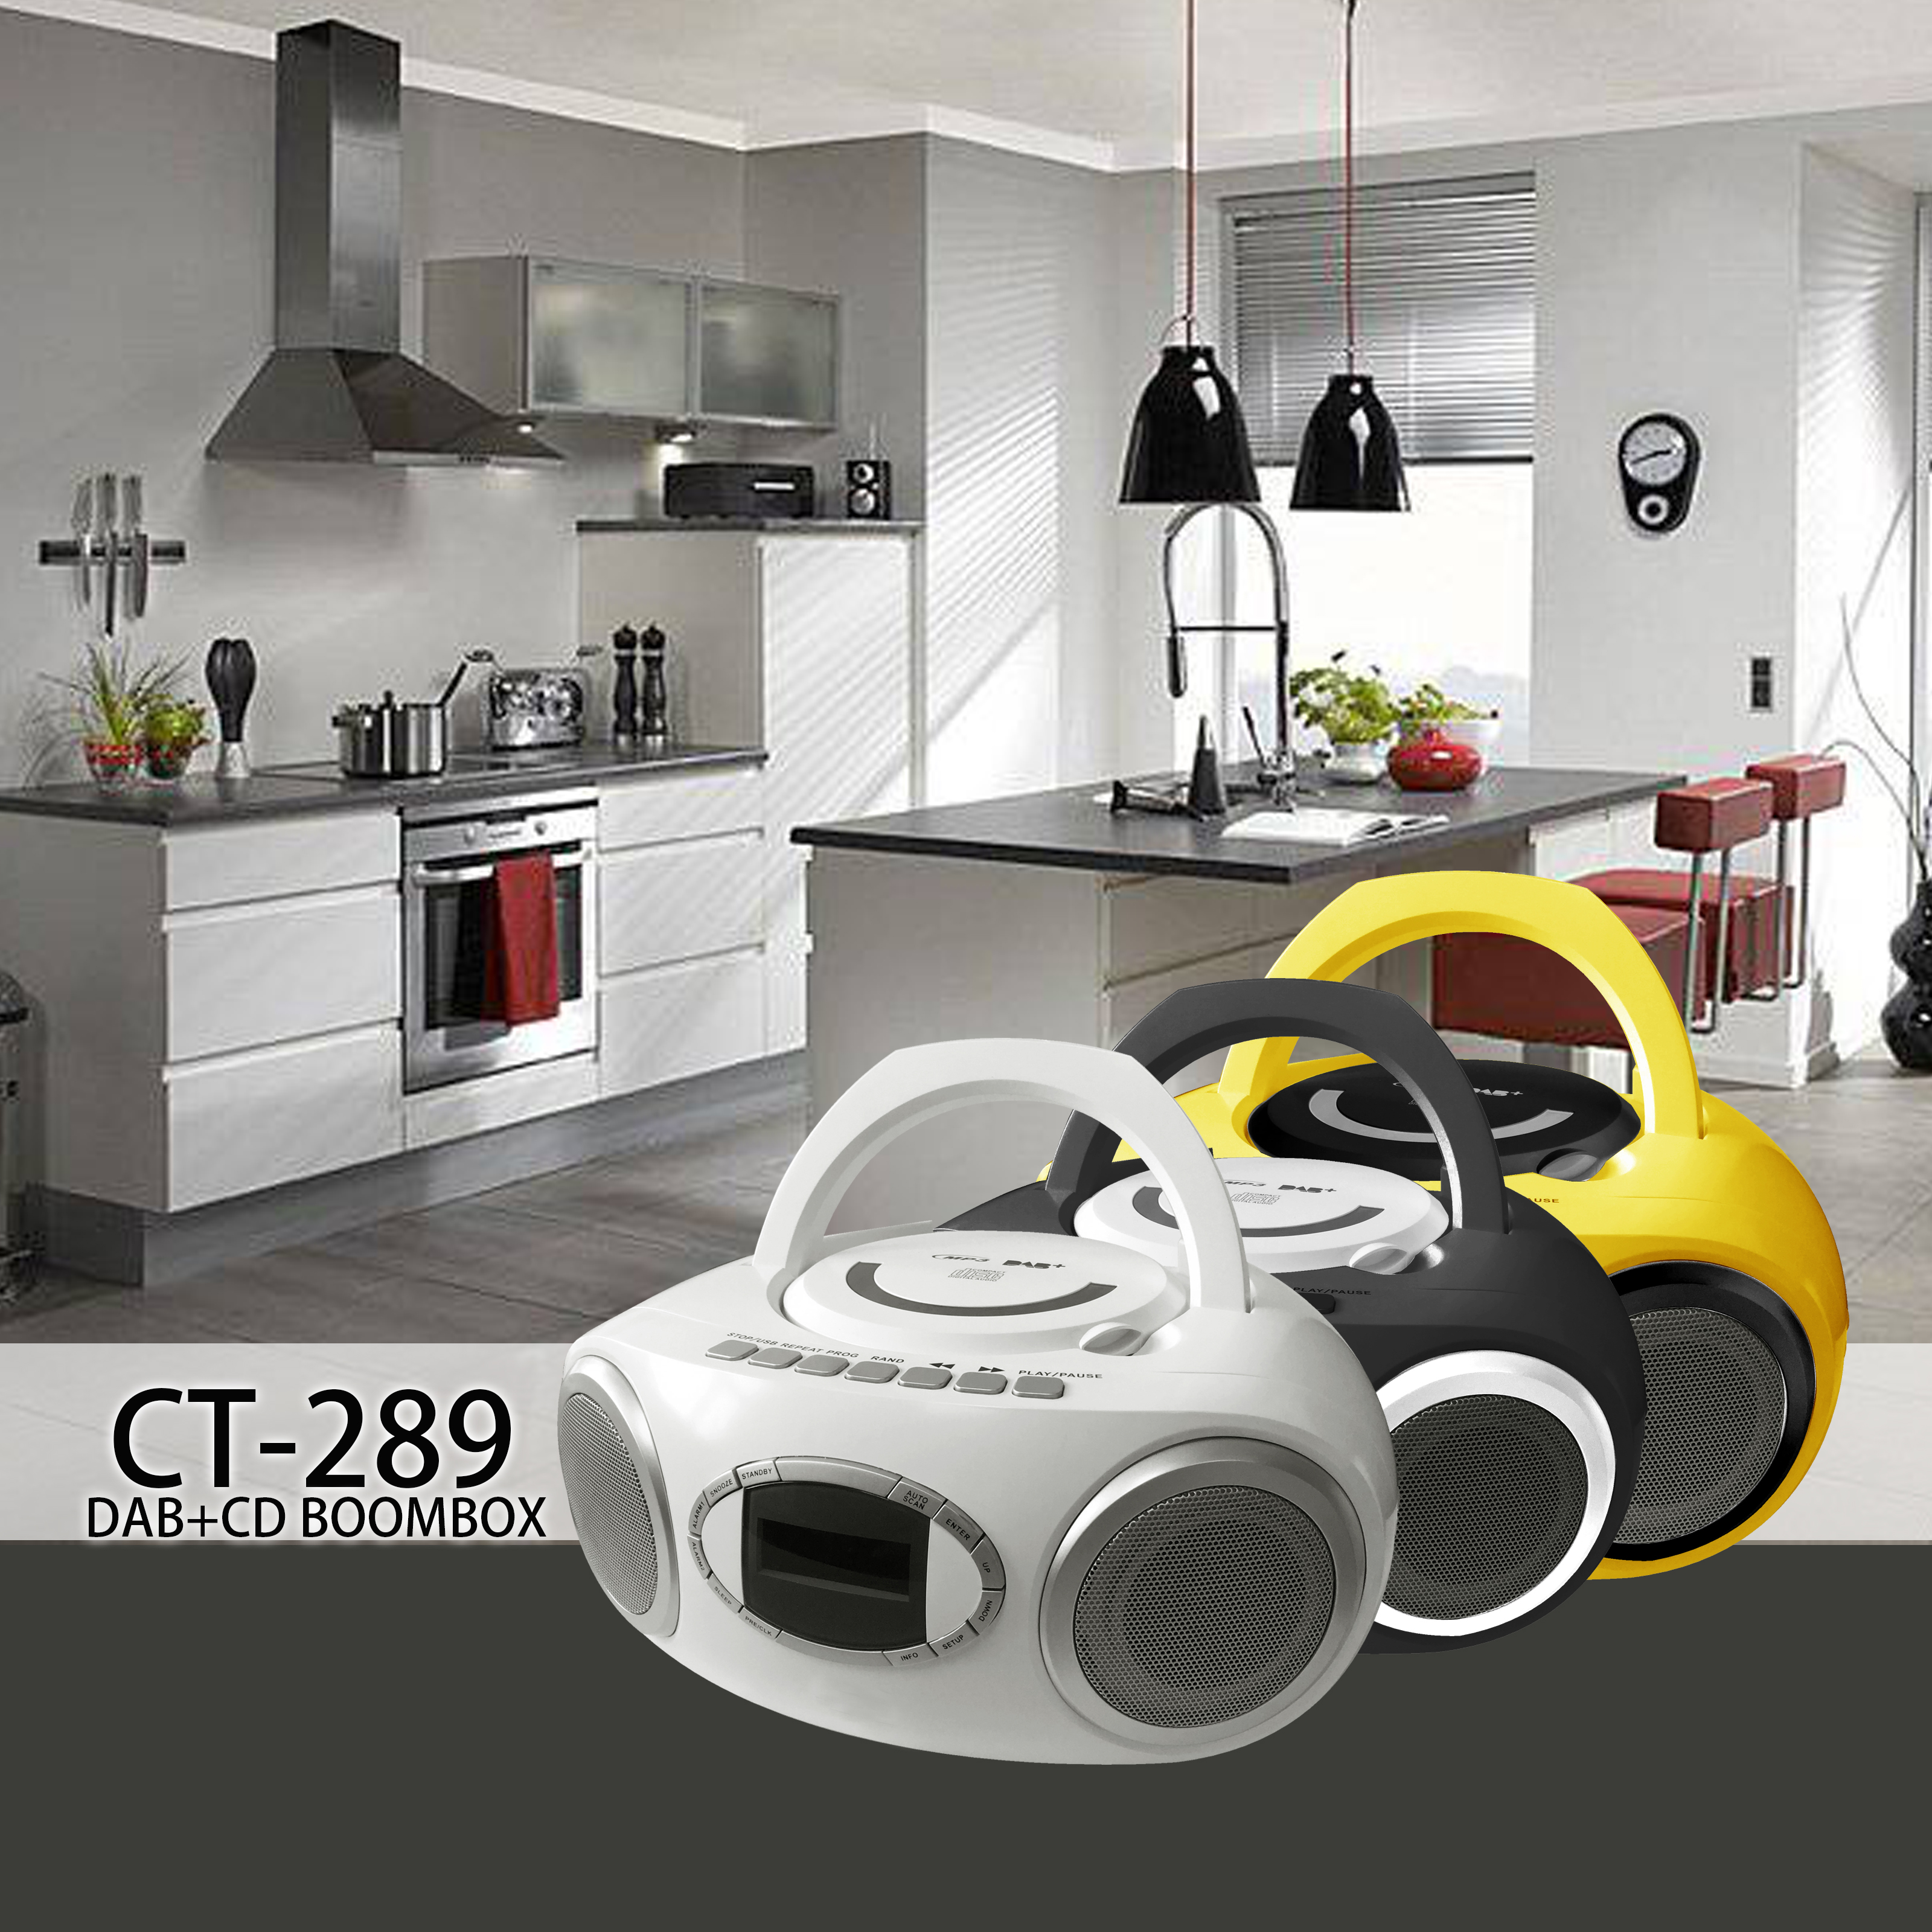 CT-289 DAB+ CD BOOMBOX kitchen.jpg